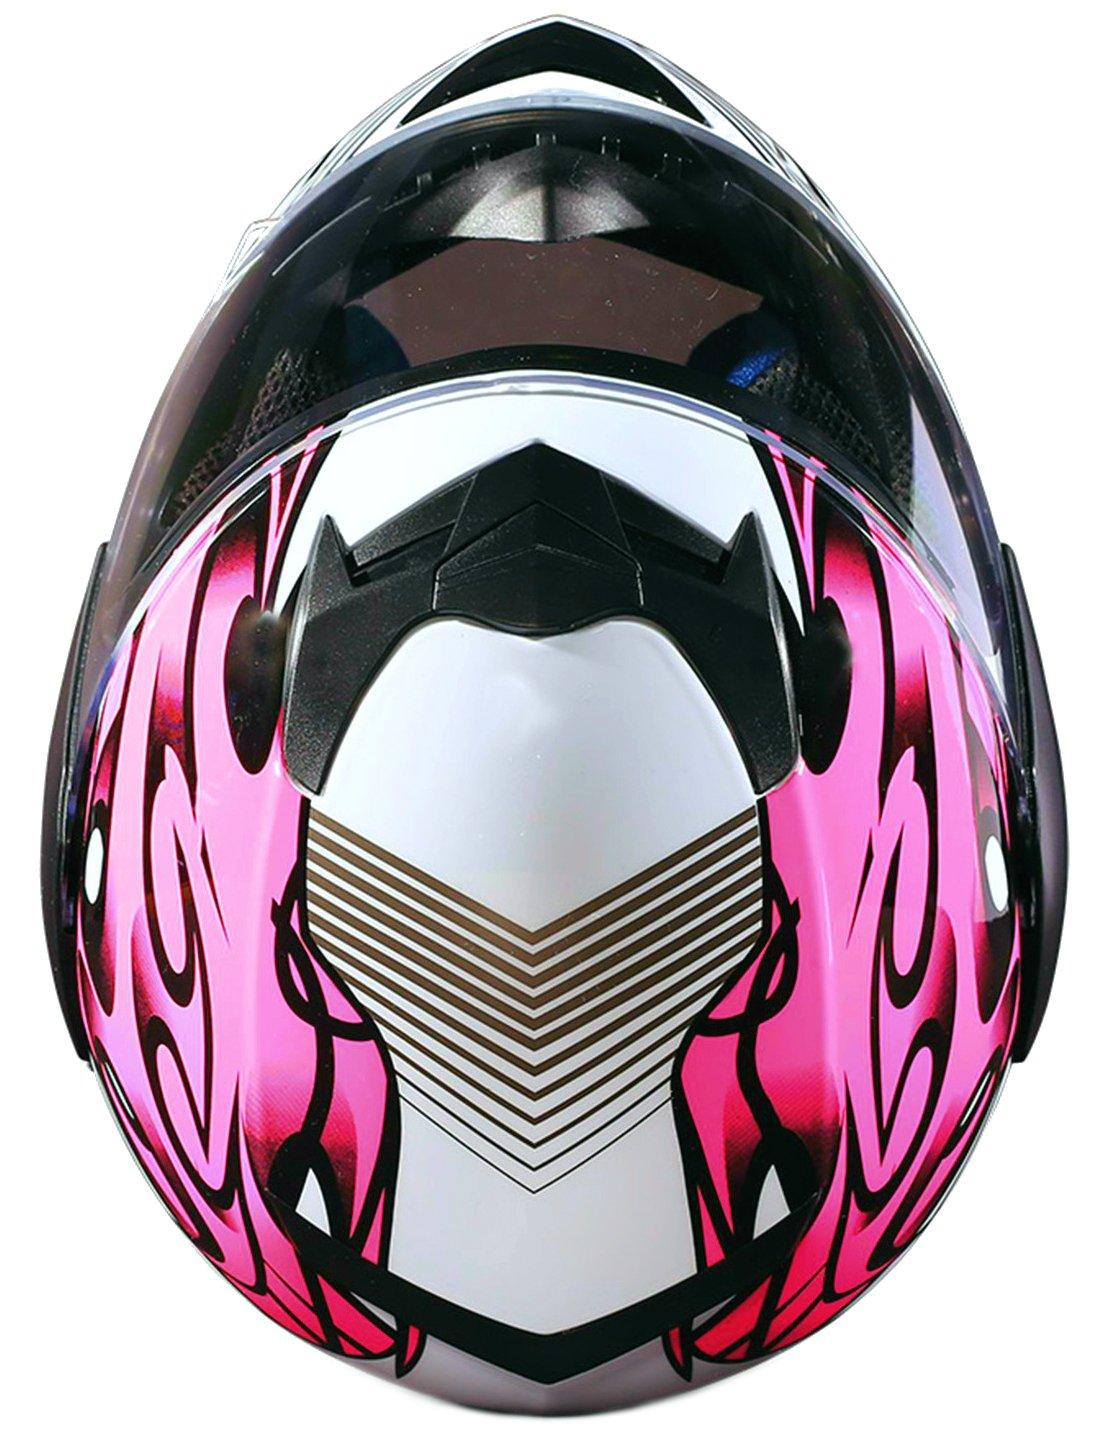 Youth Kids Full Face Helmet with Shield Motorcycle Street MX Dirtbike ATV - Pink (XL) by Typhoon Helmets (Image #6)